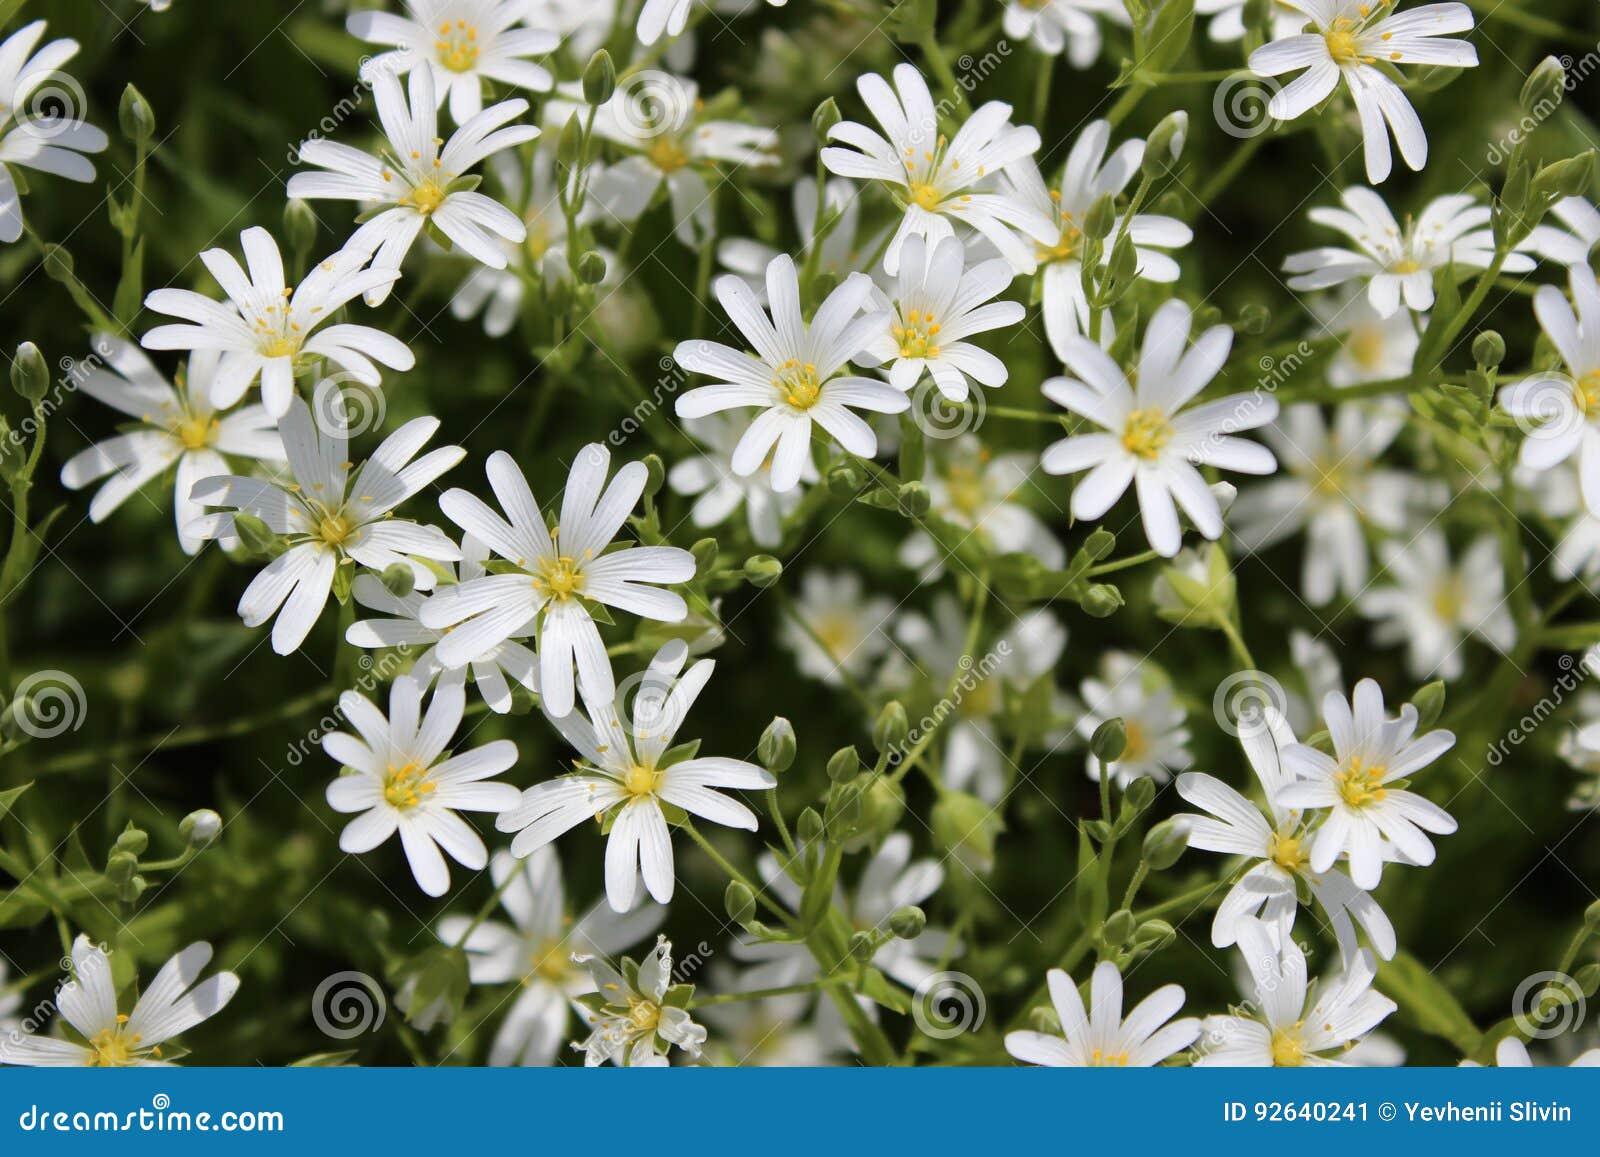 Small White Spring Flowersamomile Stock Image Image Of